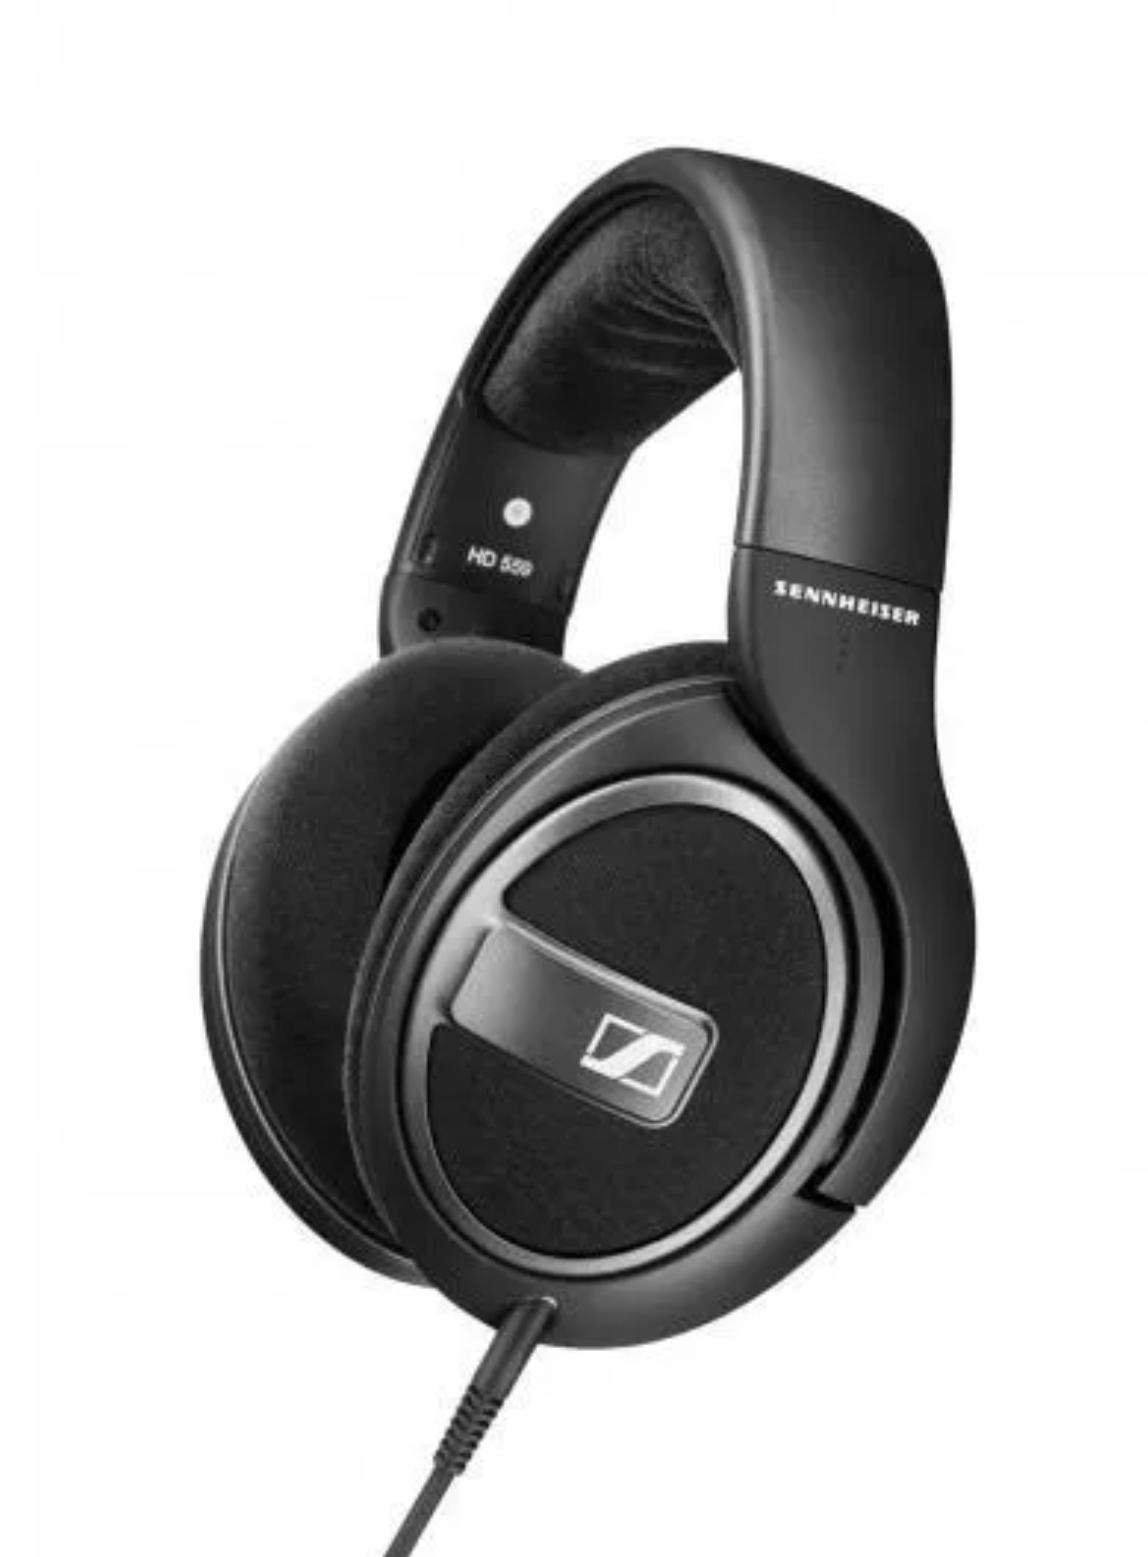 Słuchawki nauszne Sennheiser HD559 czarne. Amazon.de